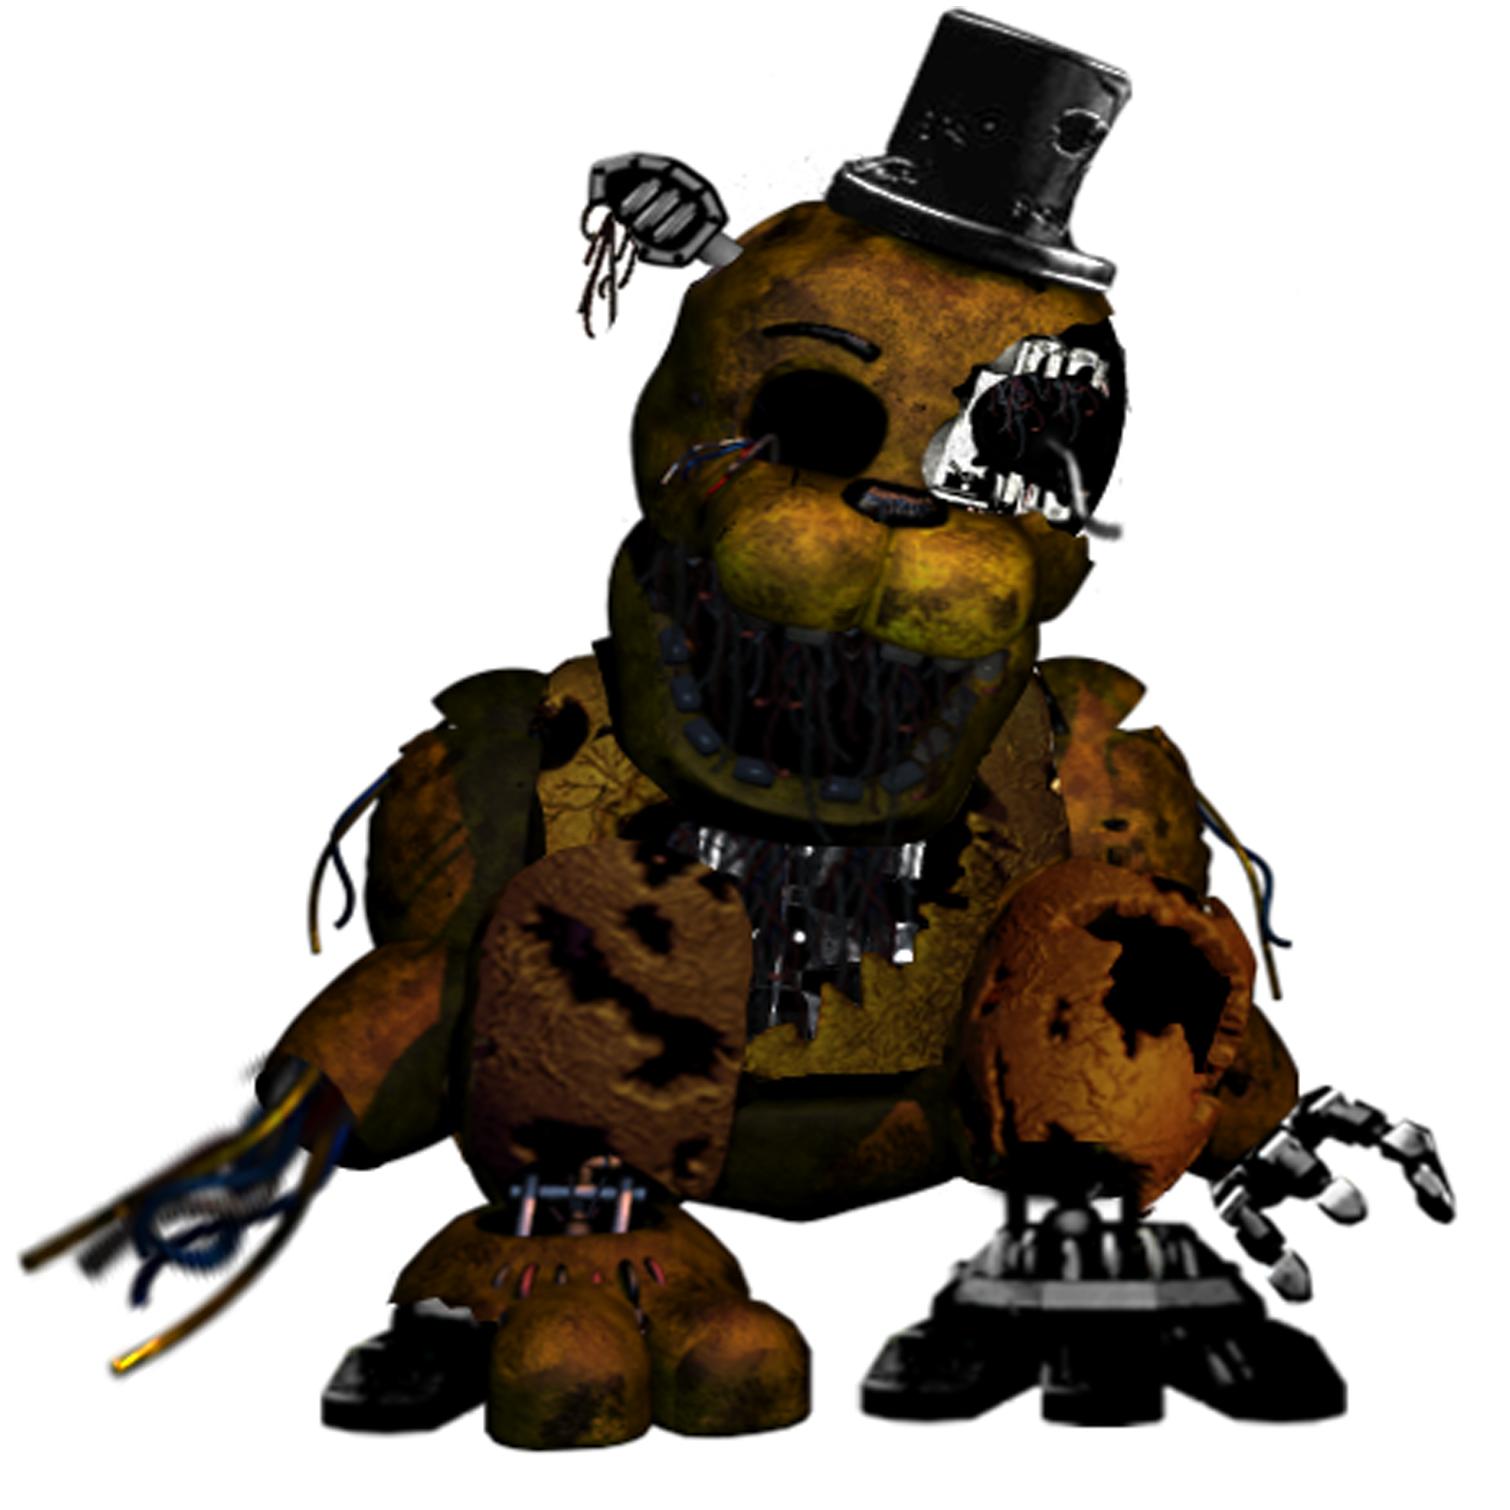 Ravaged Golden Freddy by Dangerdude991 on DeviantArt